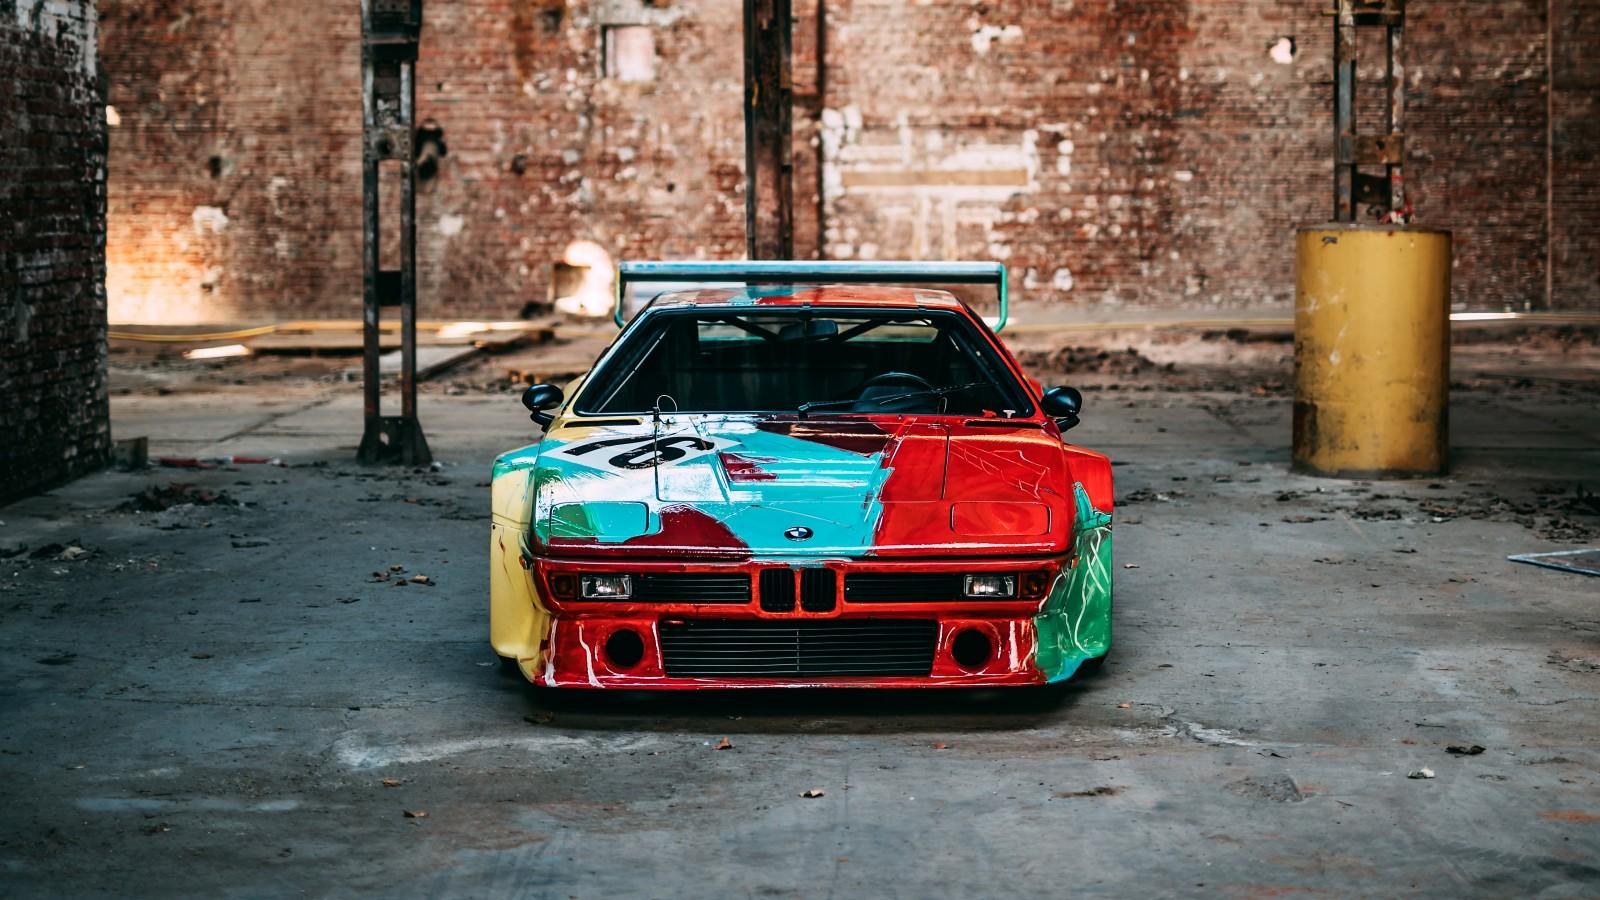 Bmw M1 Group 4 Rennversion Art Car By Andy Warhol